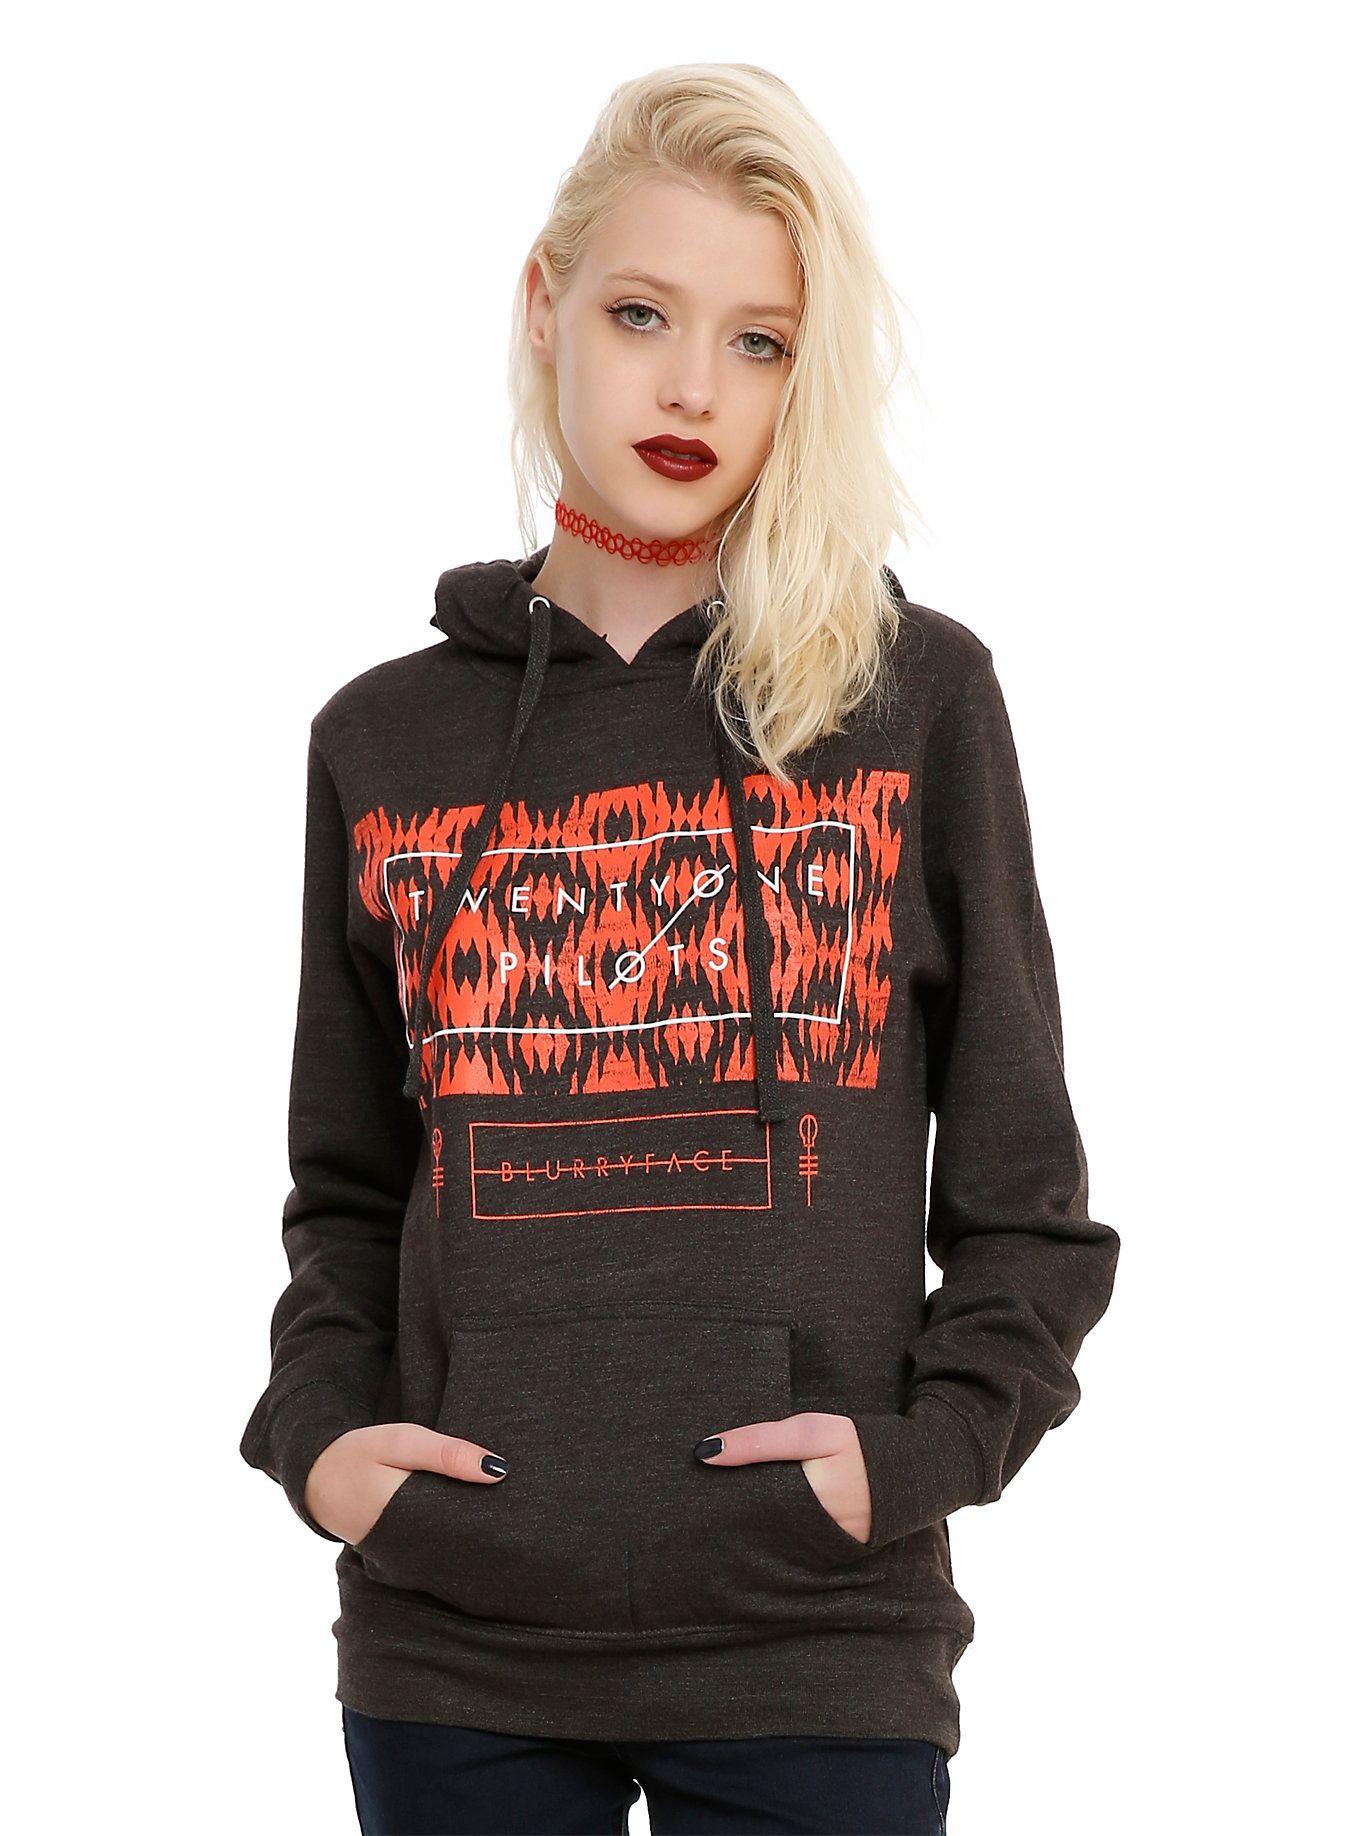 e5e4cfcdb Twenty One Pilots Blurryface Girls Hoodie | My Kind of Fashion ...